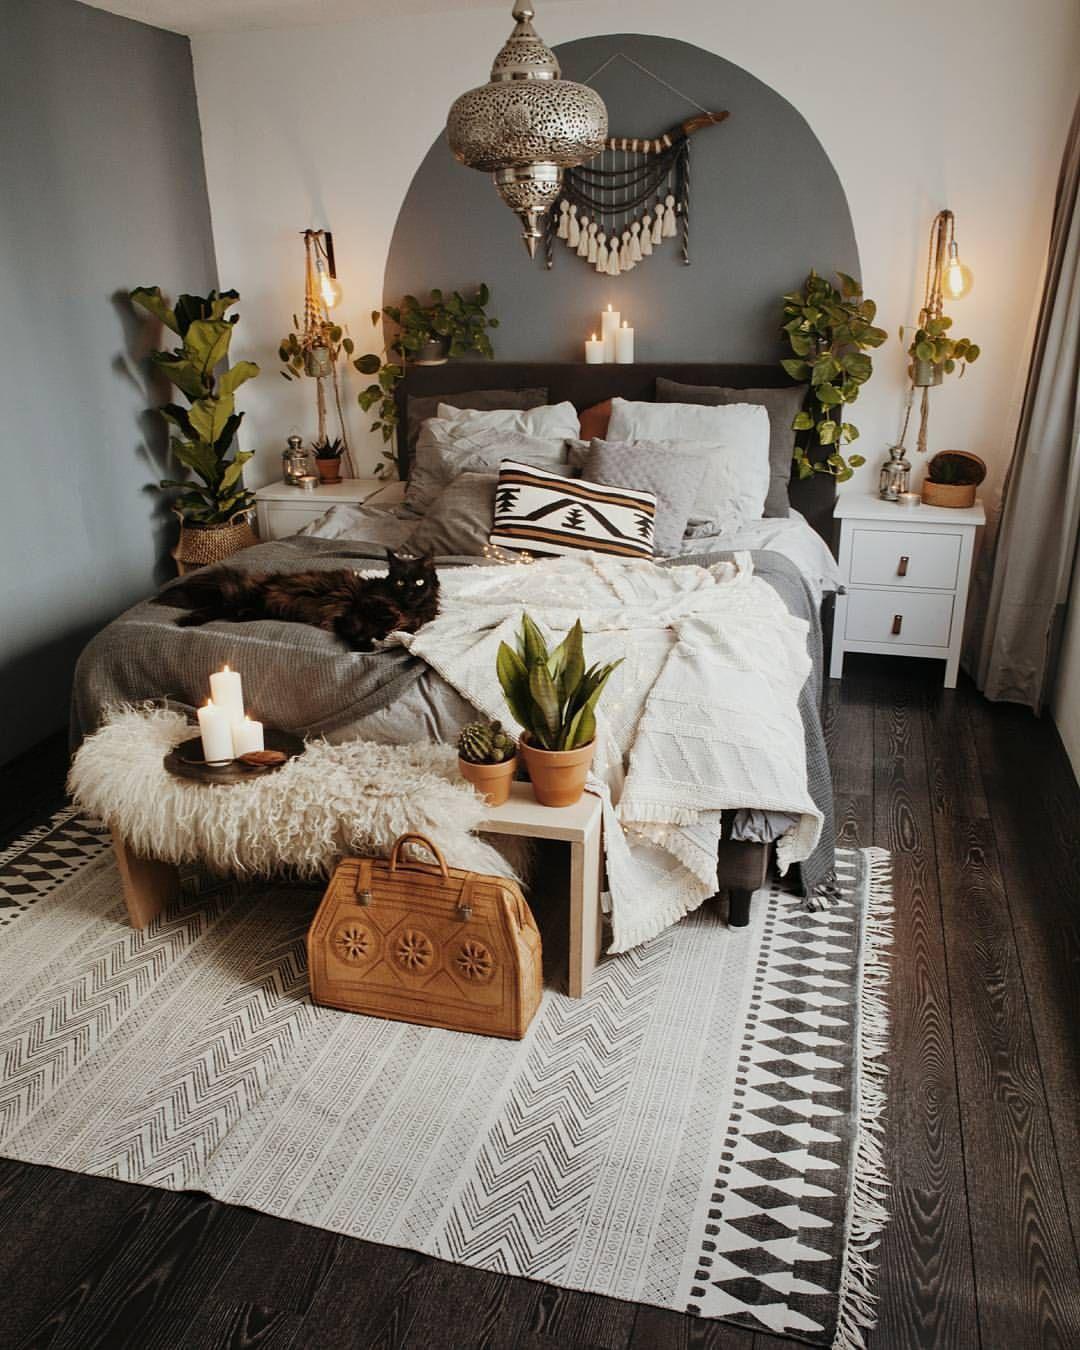 minimalist boho bedroom home bedroom room inspiration on home interior design bedroom id=34354